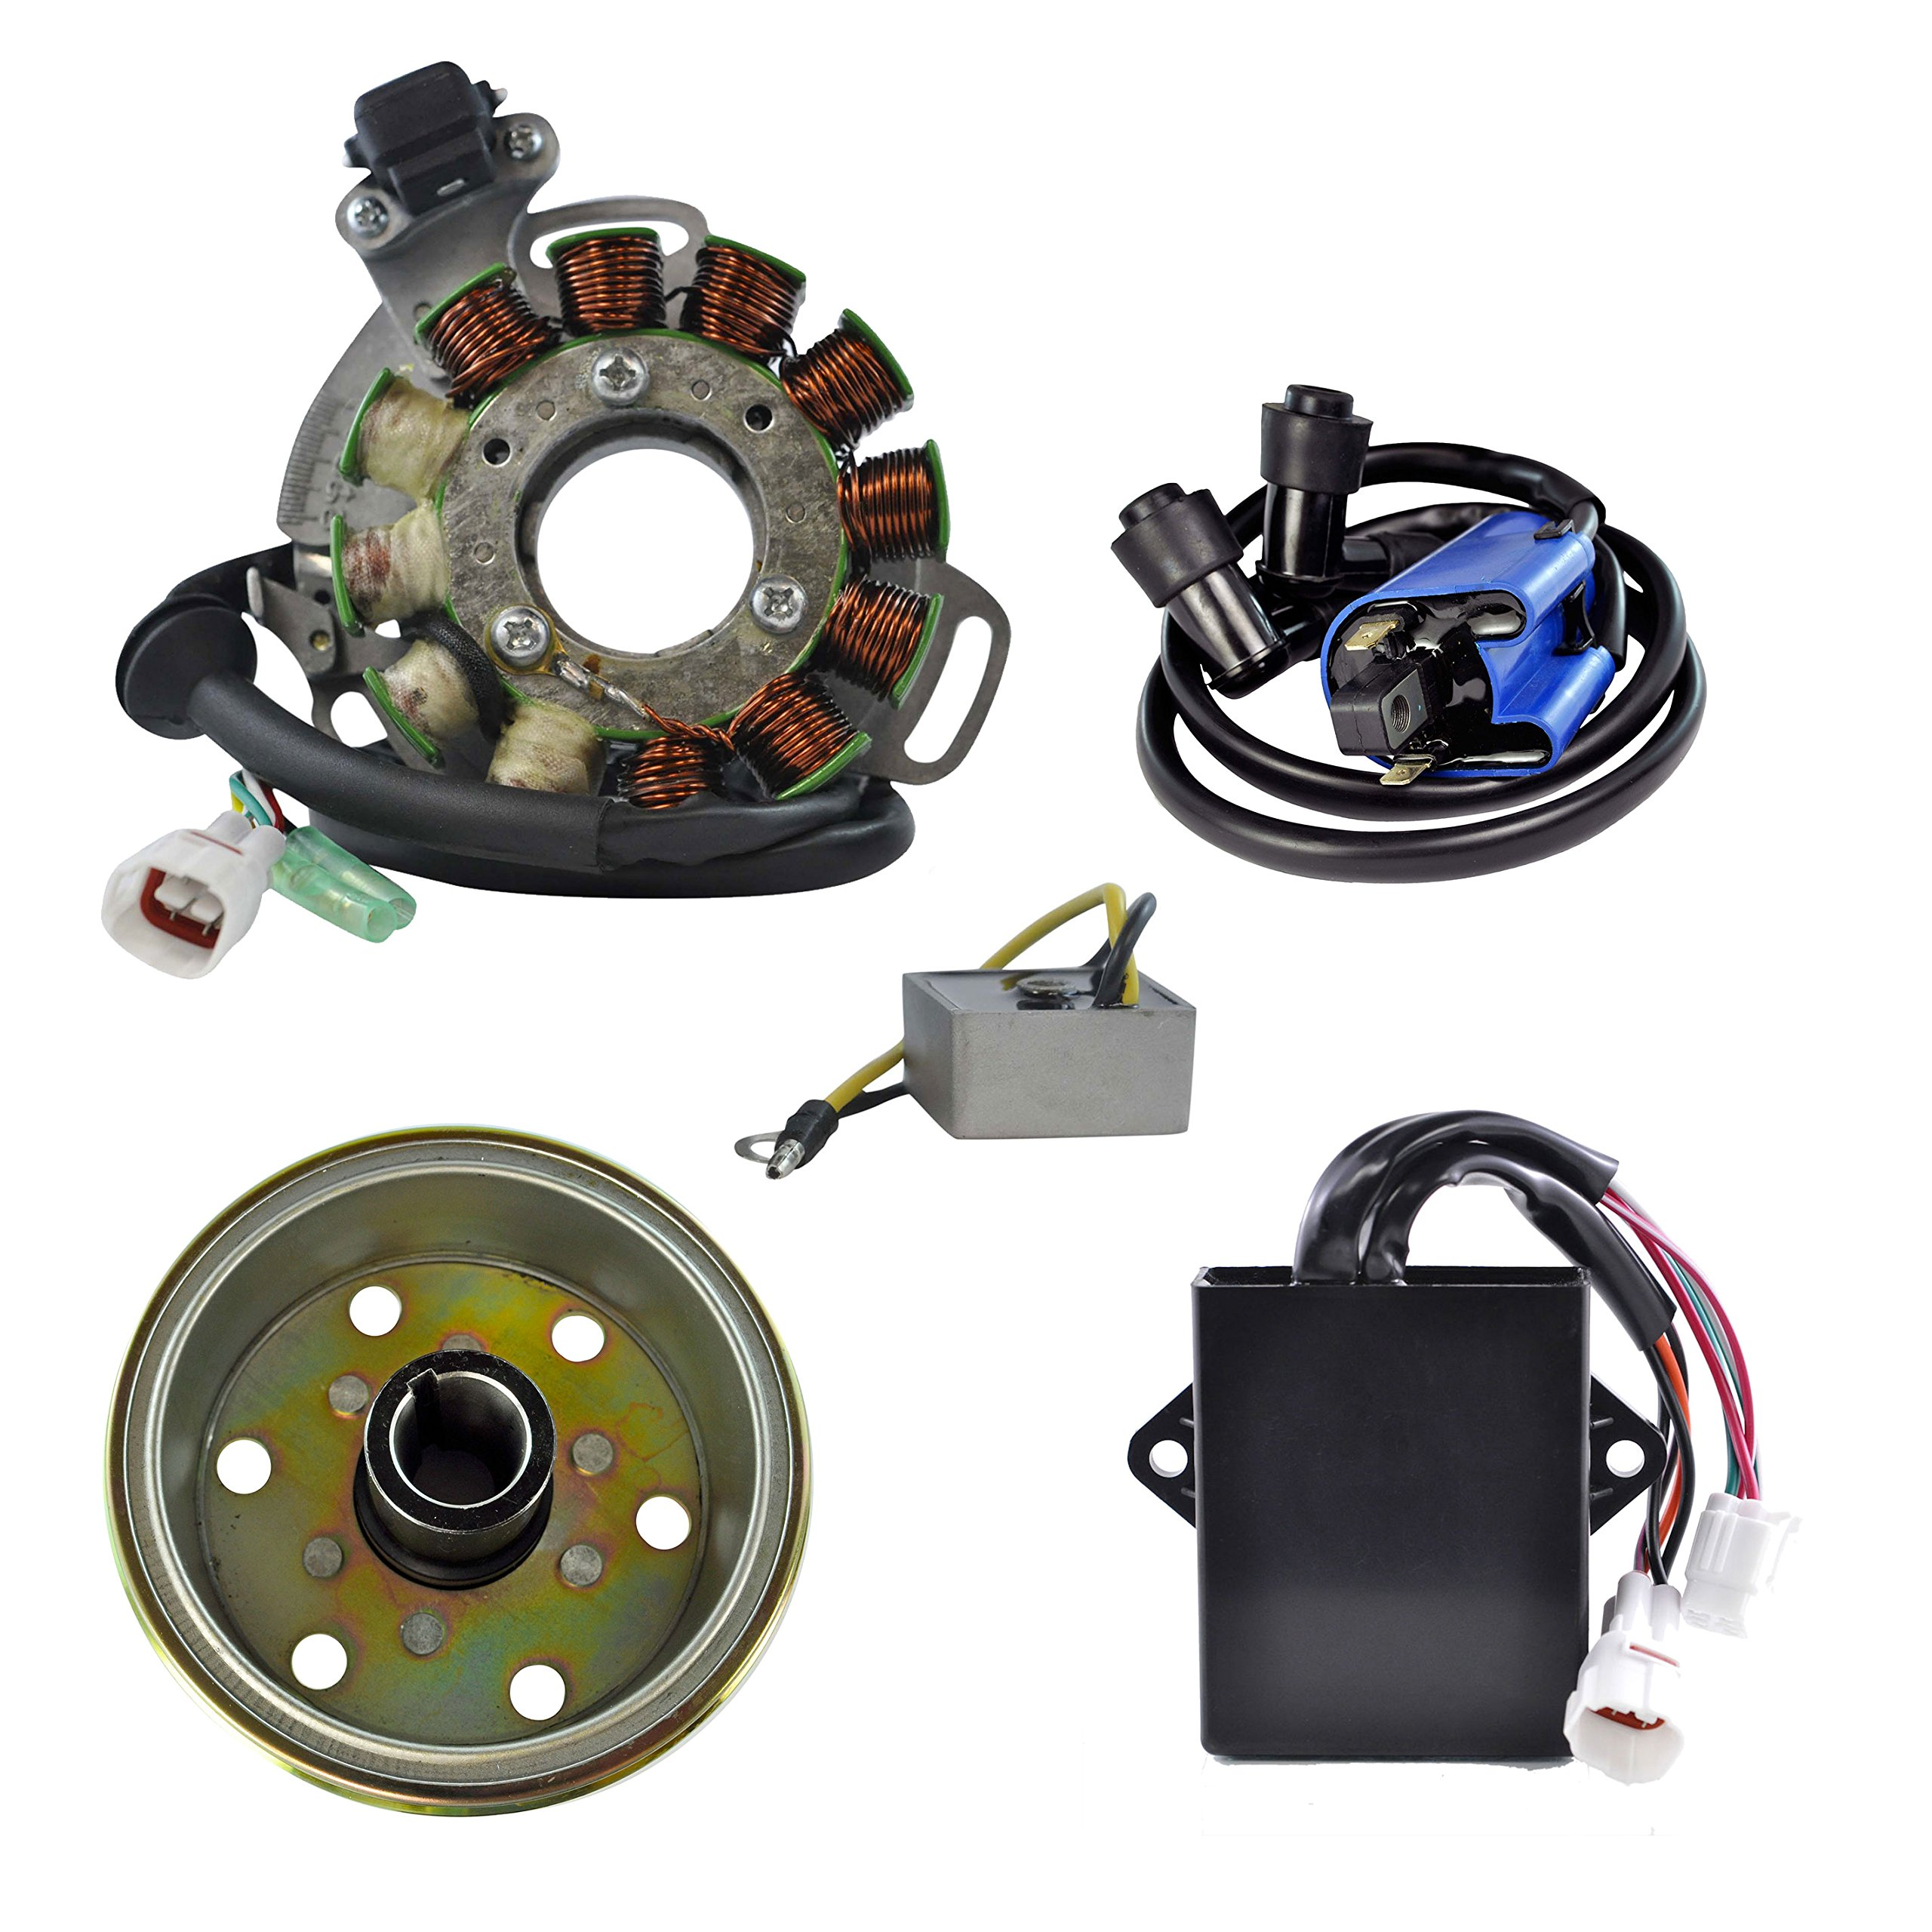 Kit High Output Stator 200 W + AC Regulator + HP CDI Box + Ignition Coil + Flywheel For Yamaha YFZ 350 Banshee 1995-1996